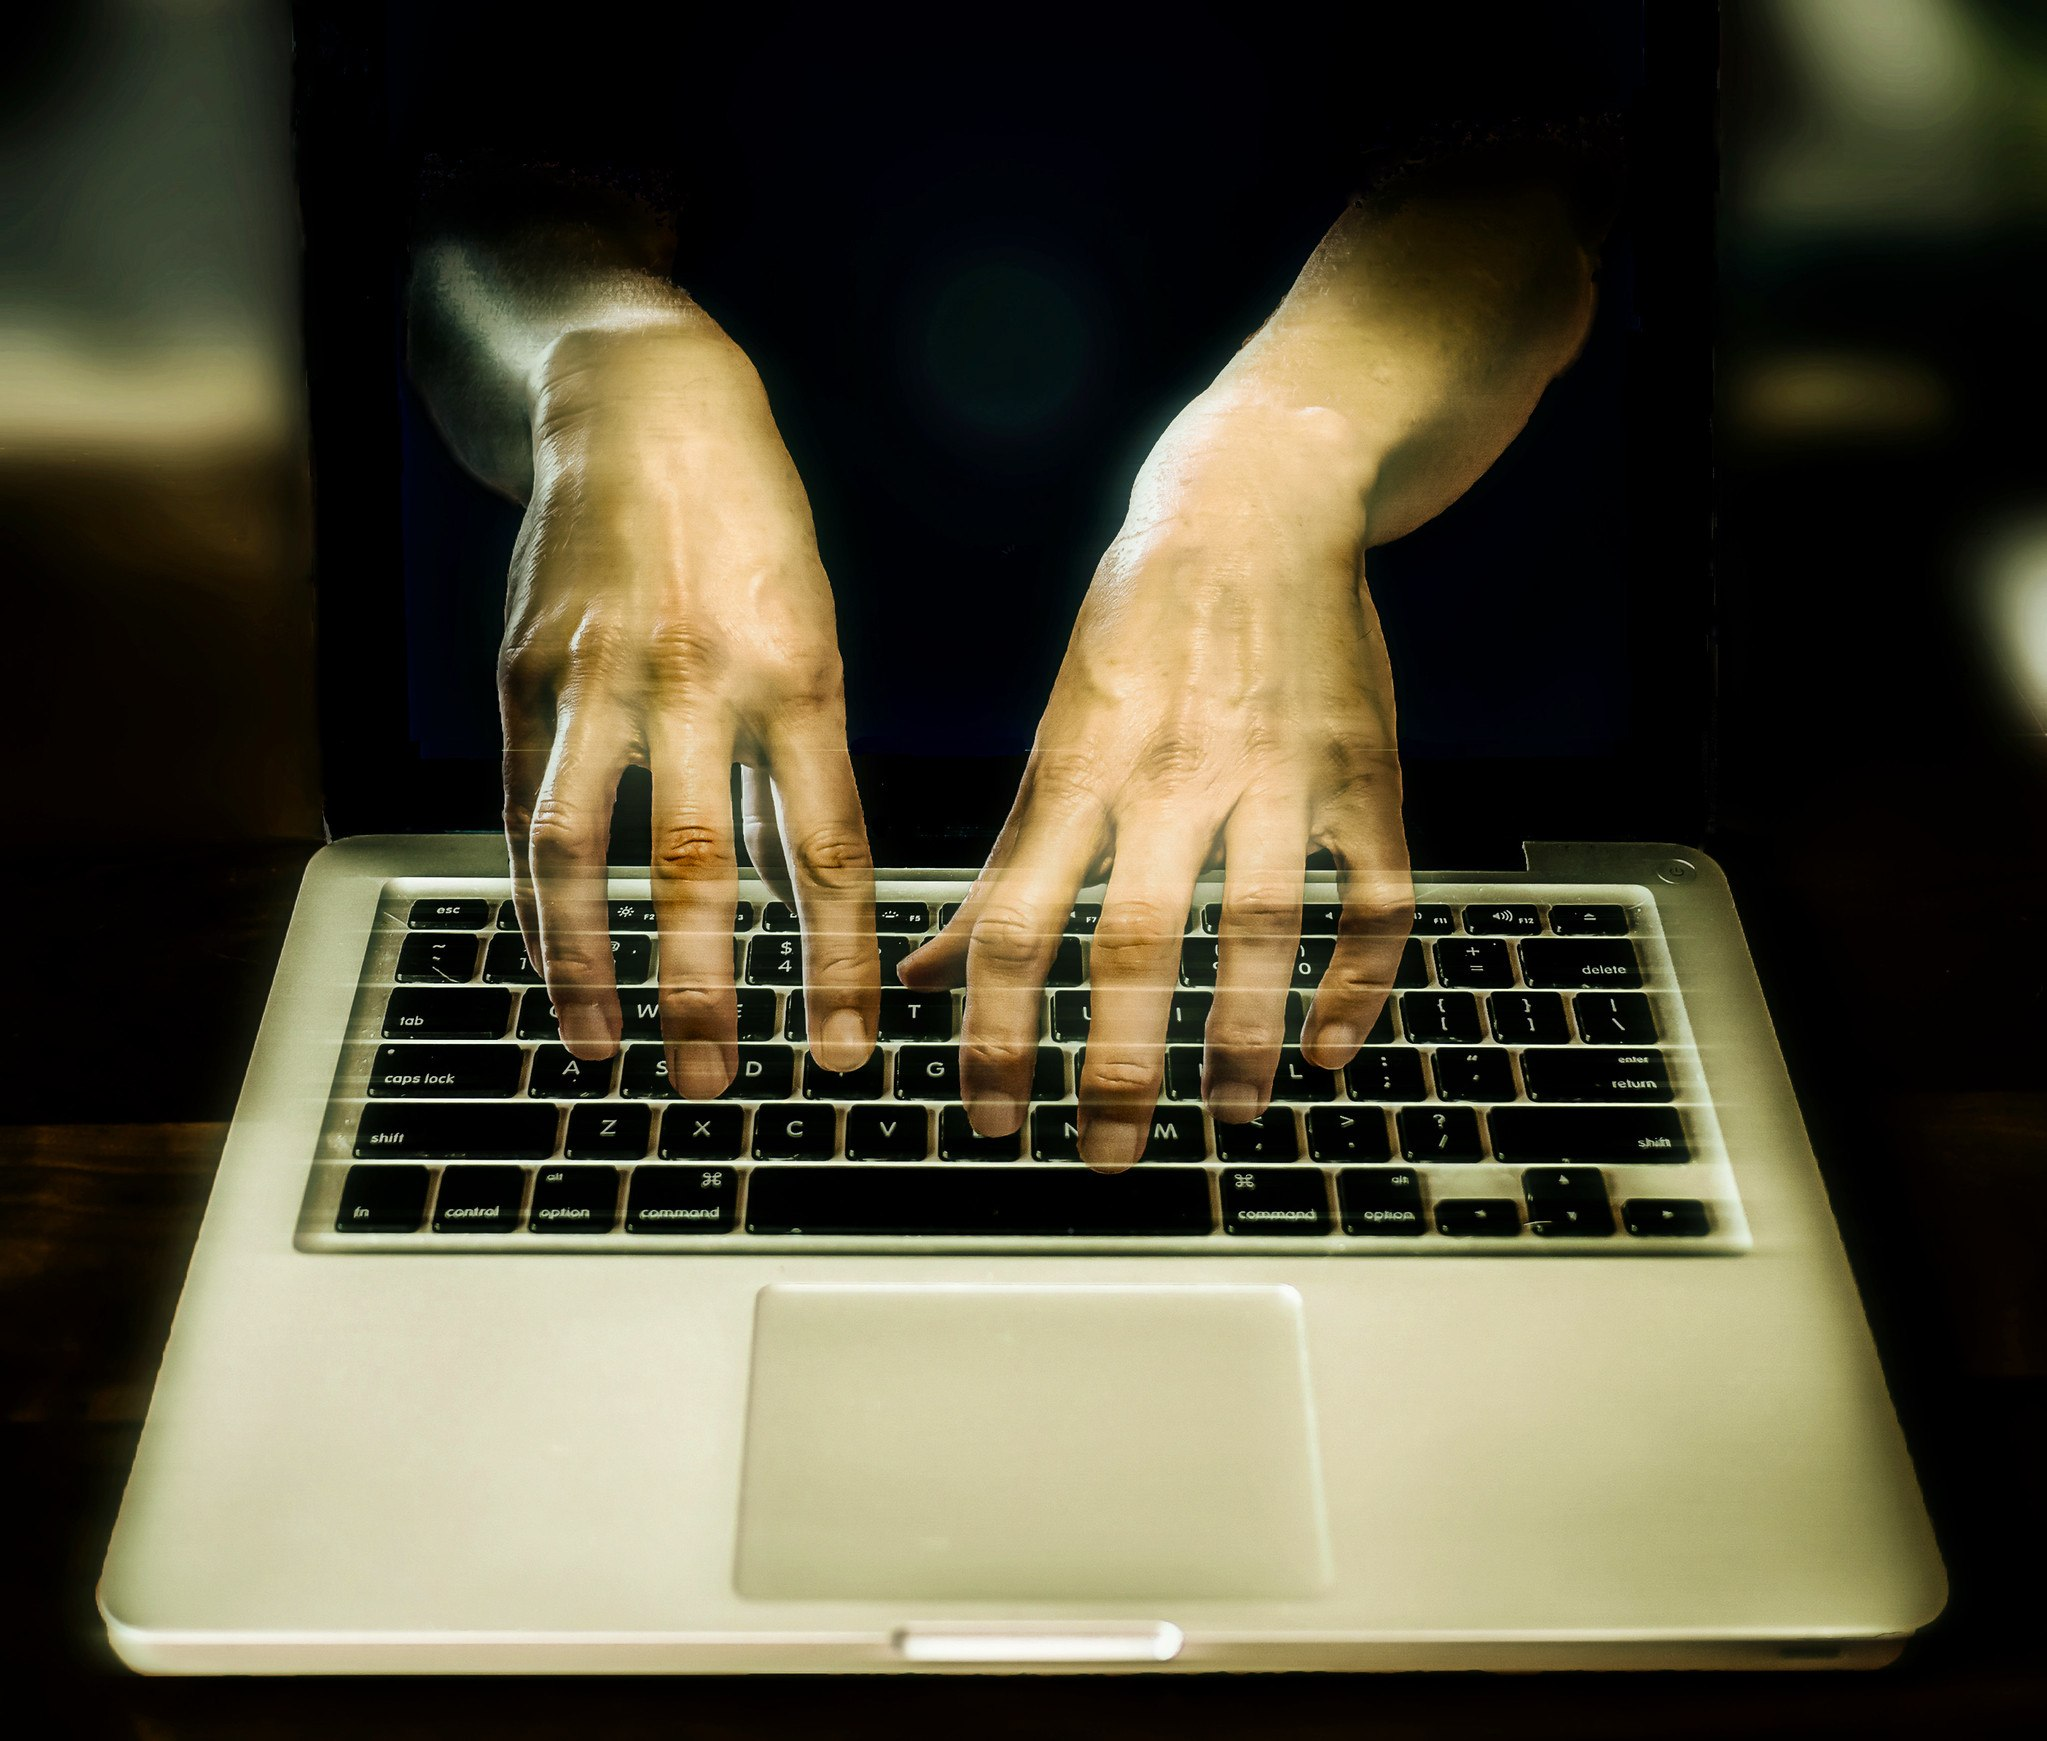 Cyper Criminality, Cyber Kriminalität, Identitätsdiebstahl